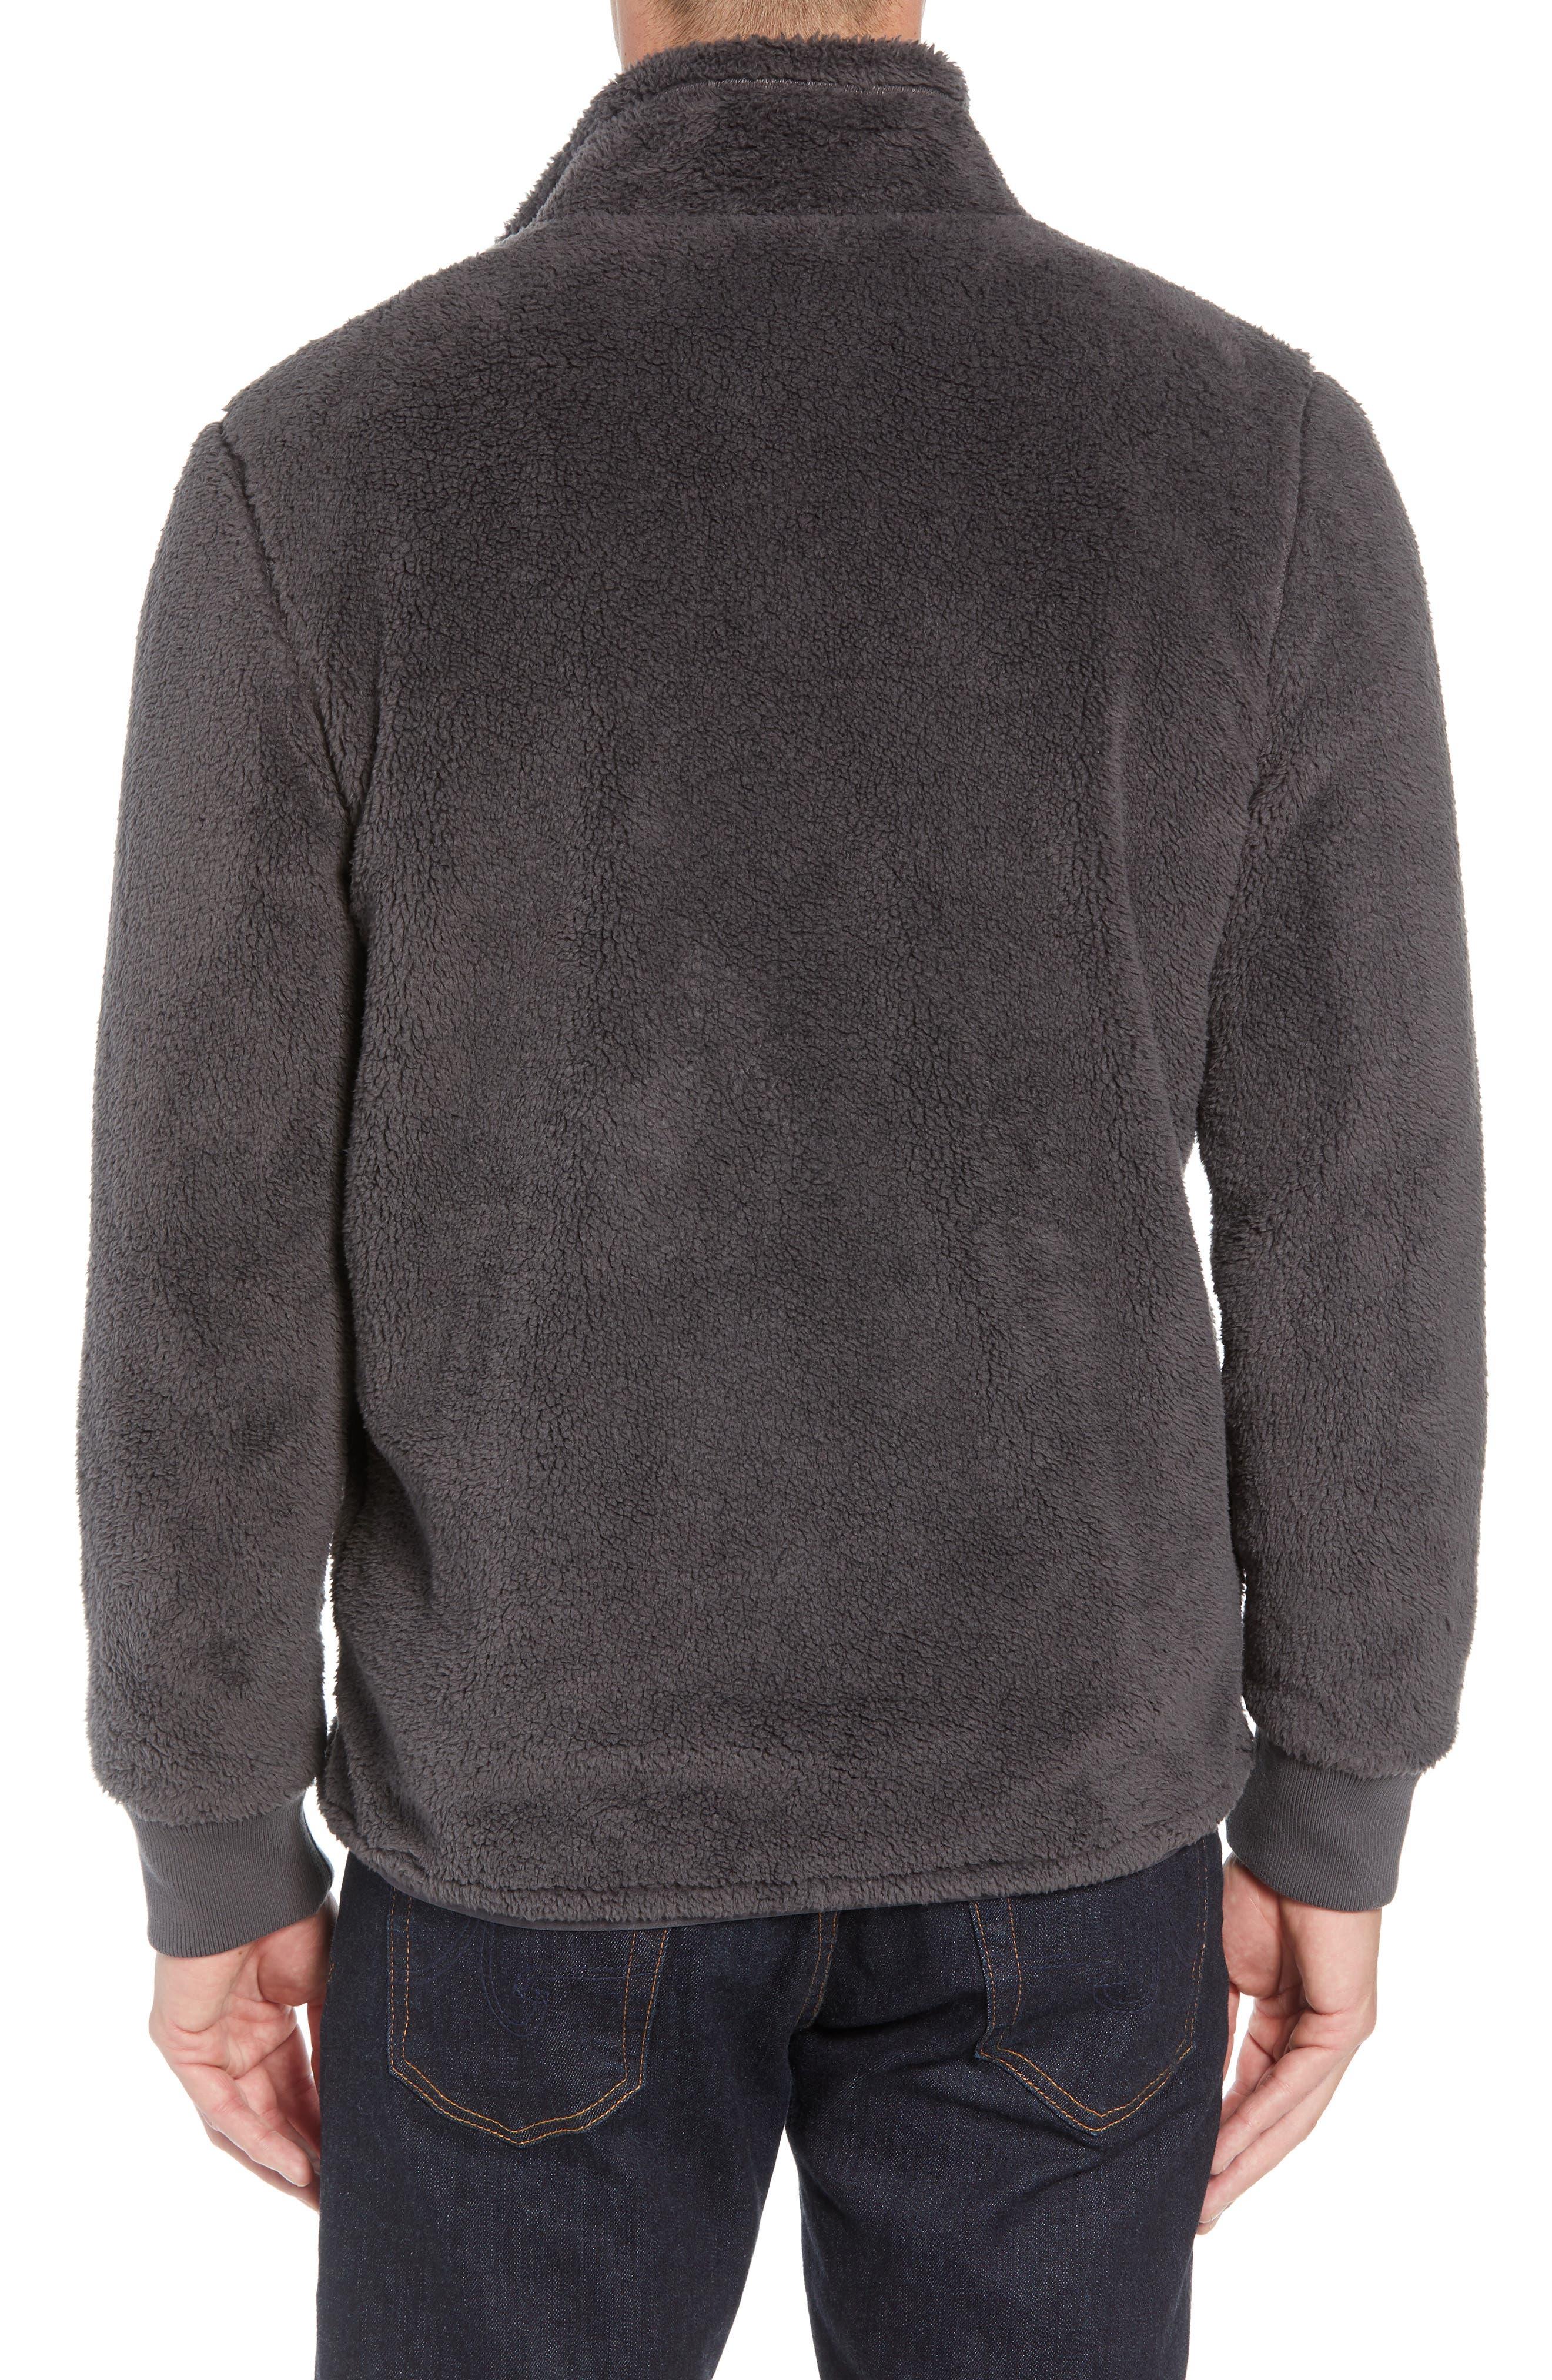 UGG<SUP>®</SUP>, Lucas High Pile Fleece Sweater Jacket, Alternate thumbnail 2, color, CHARCOAL